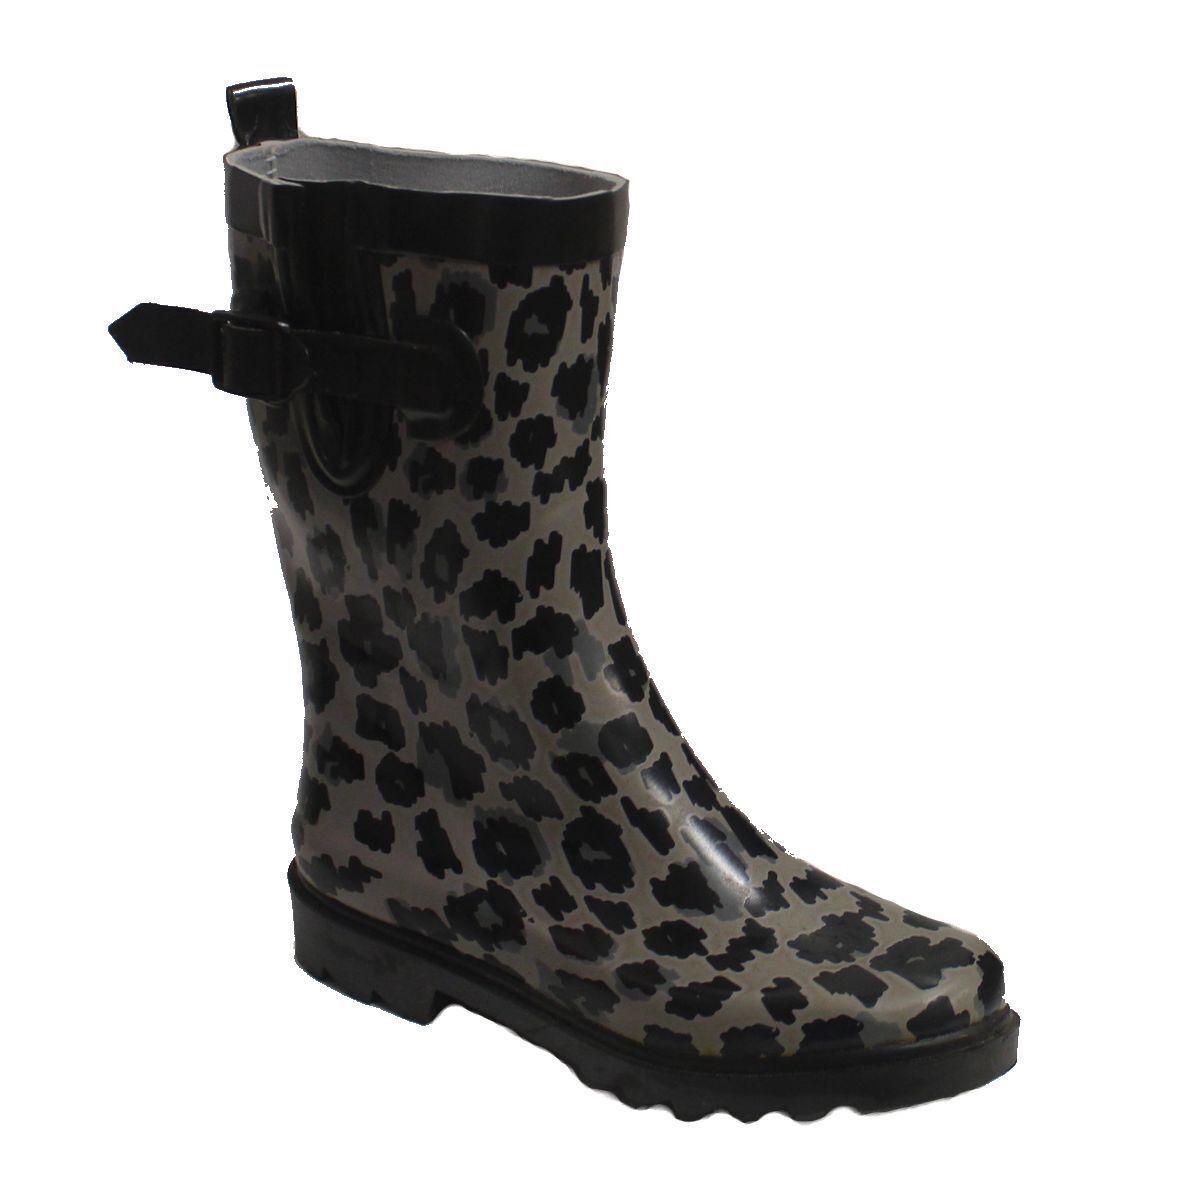 Capelli New York Women's Leopard Rain Boot Black/Grey US 10 NOB NWD